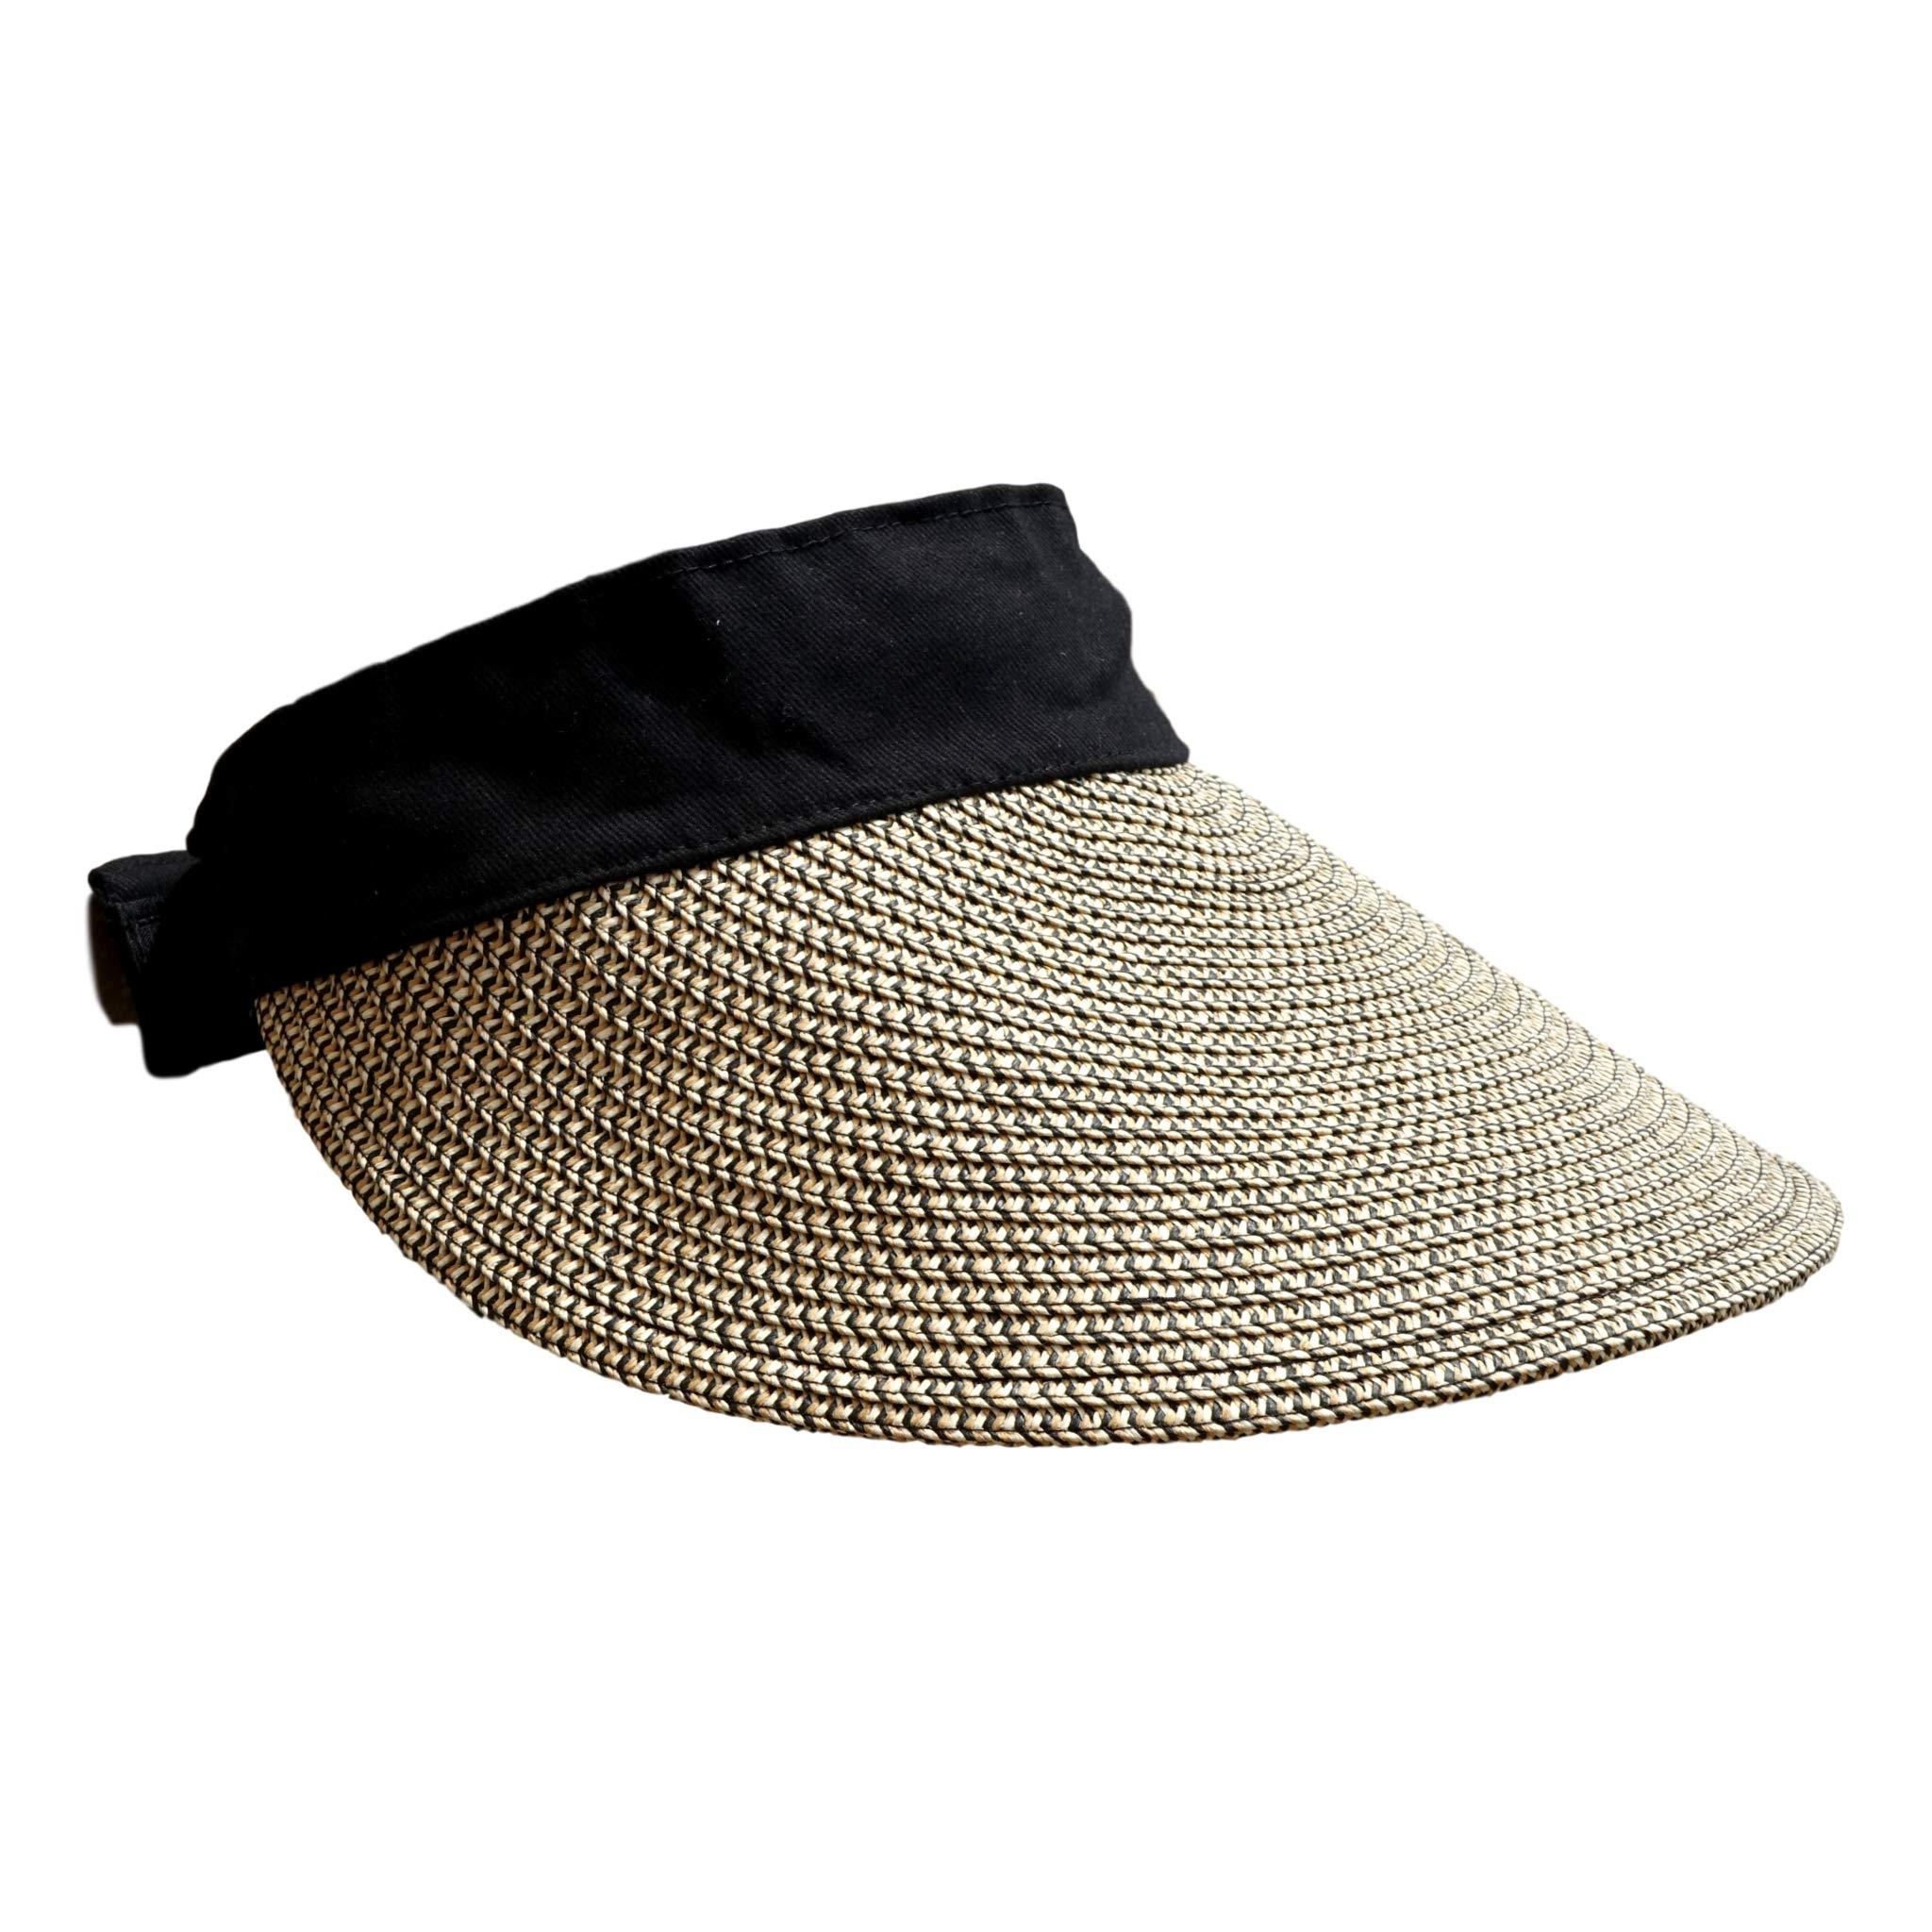 Foldable Sun Visors for Women Beach Hat Wide Brim Sun Hat Roll-Up Straw Hat